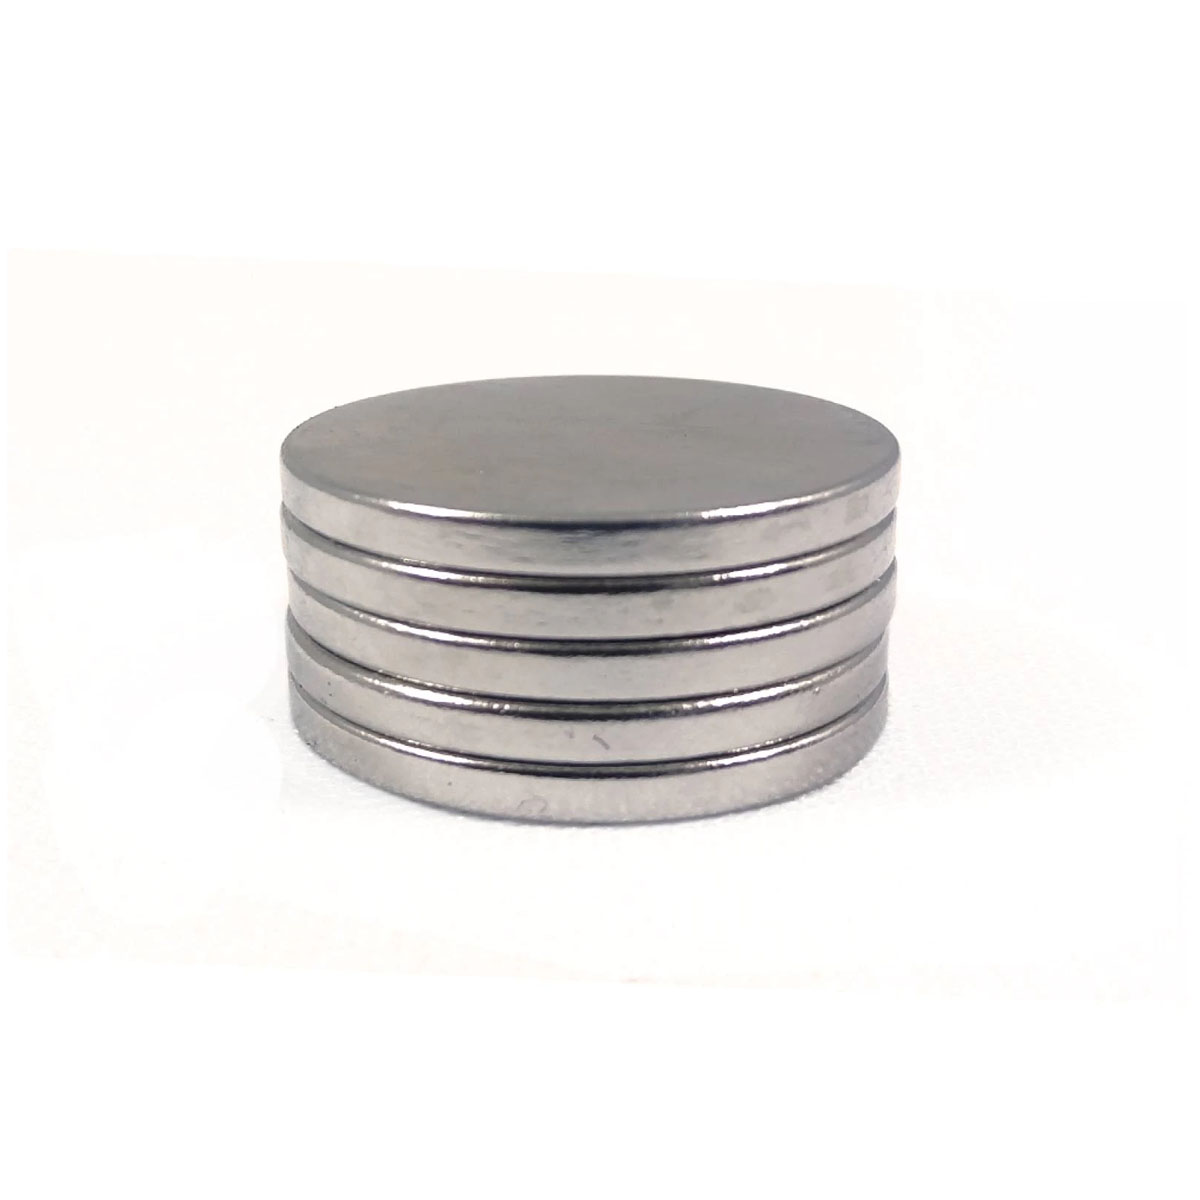 Iman Redondo Neodimio 10 X 1,8 Mm Paquete Con 5 Piezas Obi